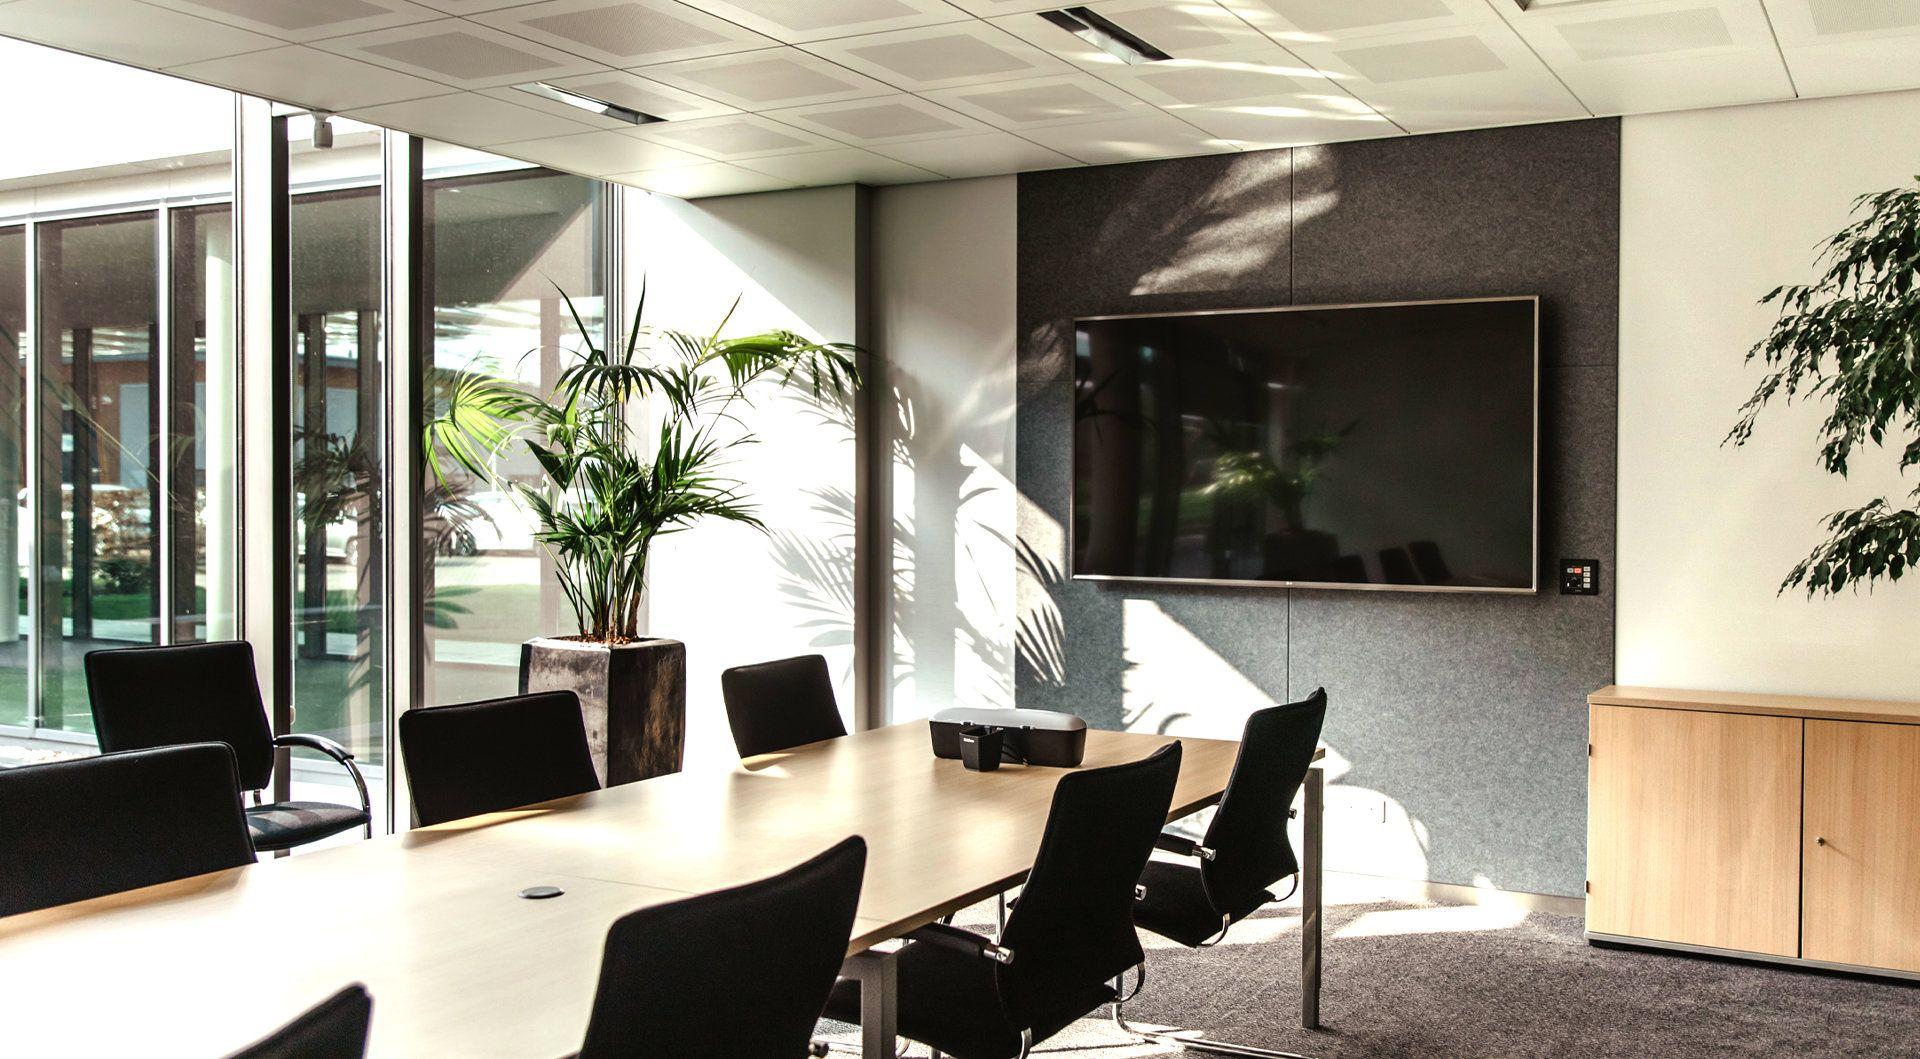 "LG 49SH7DD beeldkrant 124,5 cm (49"") LCD Full HD Digitale signage flatscreen Zwart - Case studie de vries"